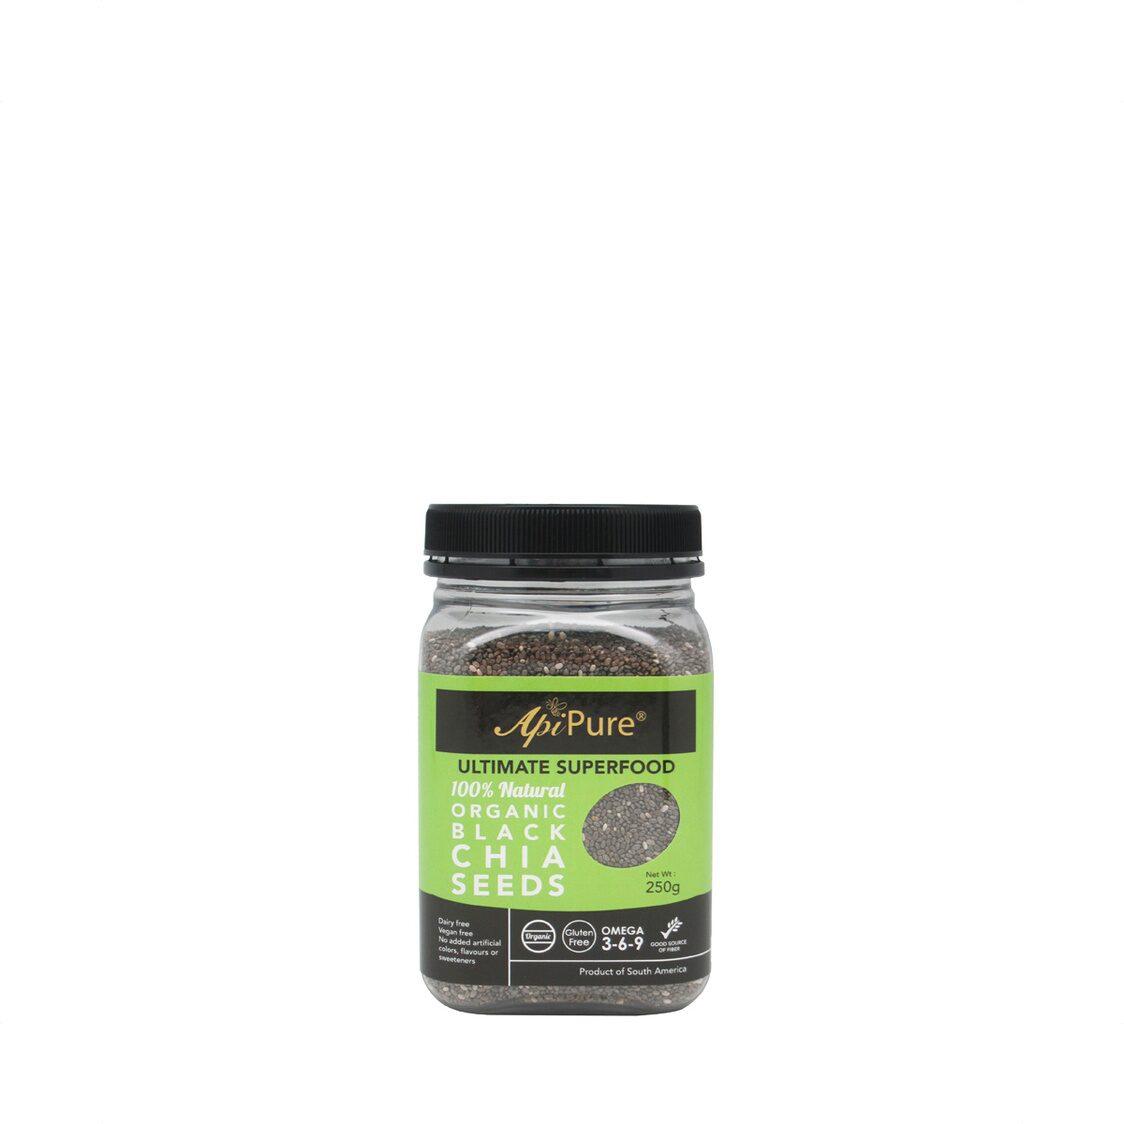 Apipure Organic Black Chia Seeds 250g